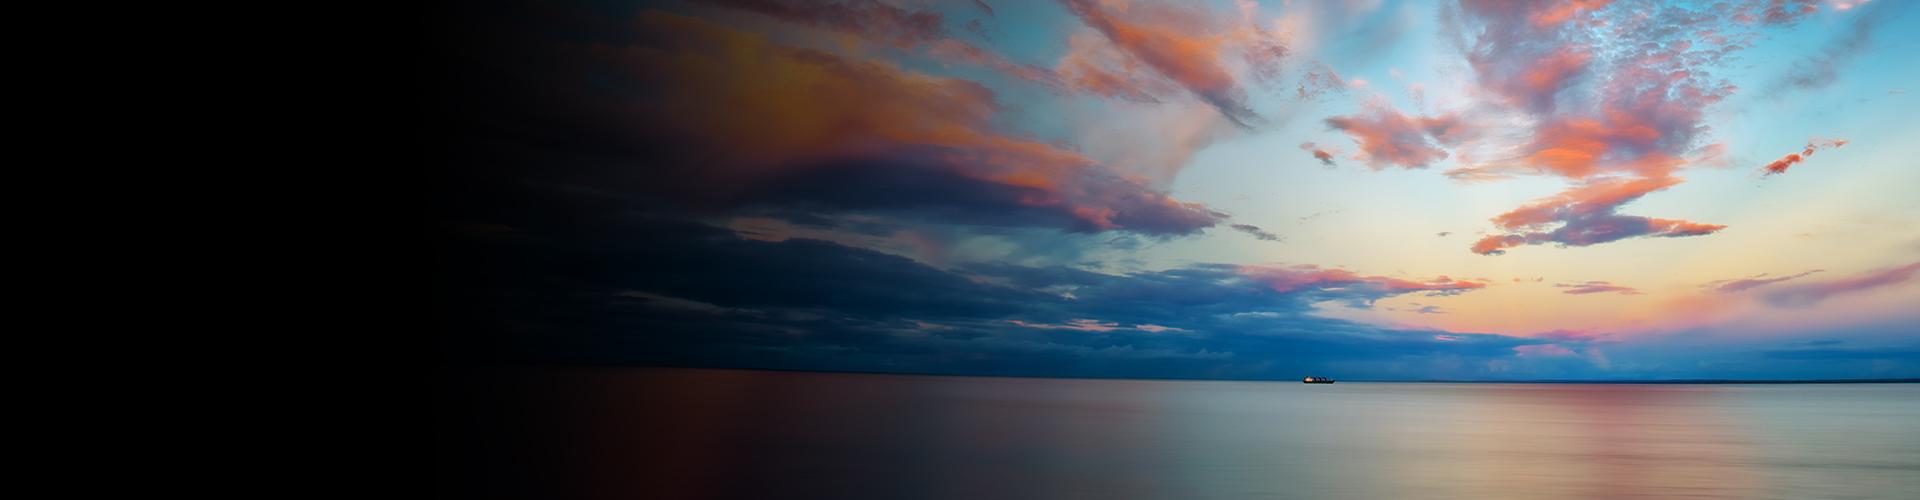 A colorful dawn sky